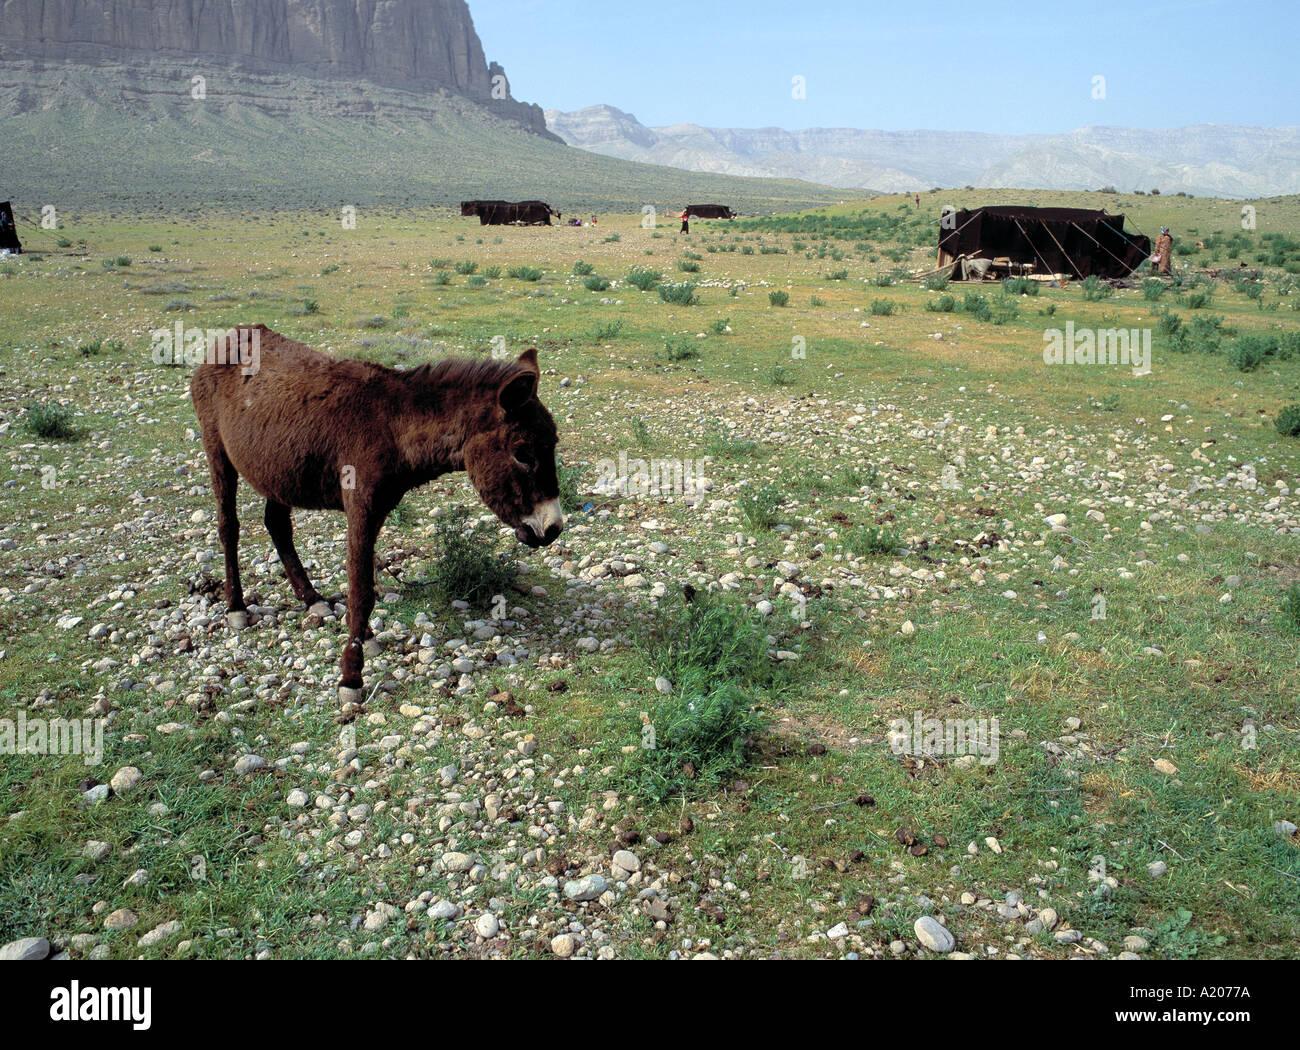 A Bedhouin encampment Shiraz - Stock Image